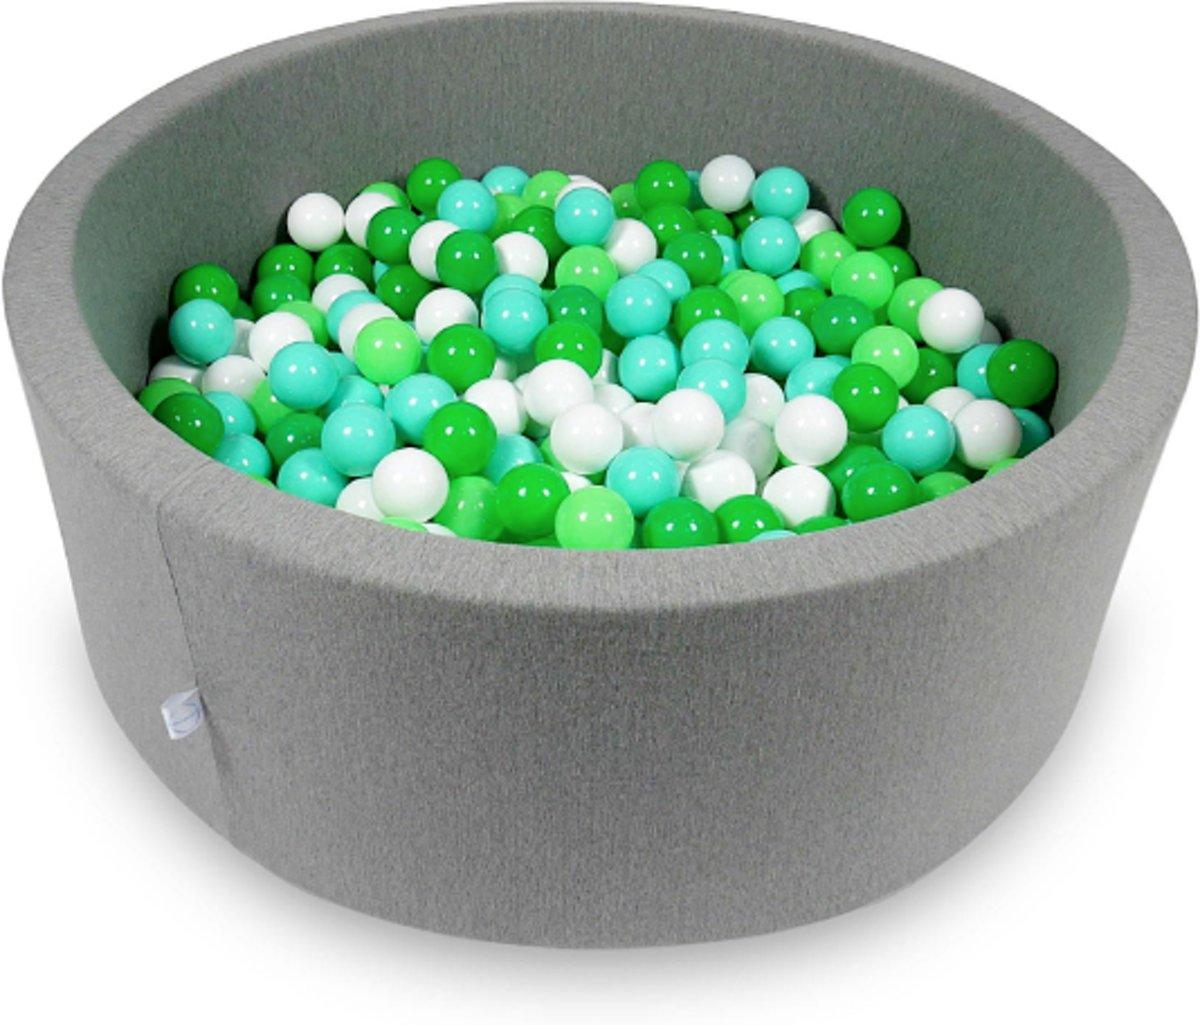 Ballenbak - 500 ballen - 115 x 40 cm - ballenbad - rond grijs